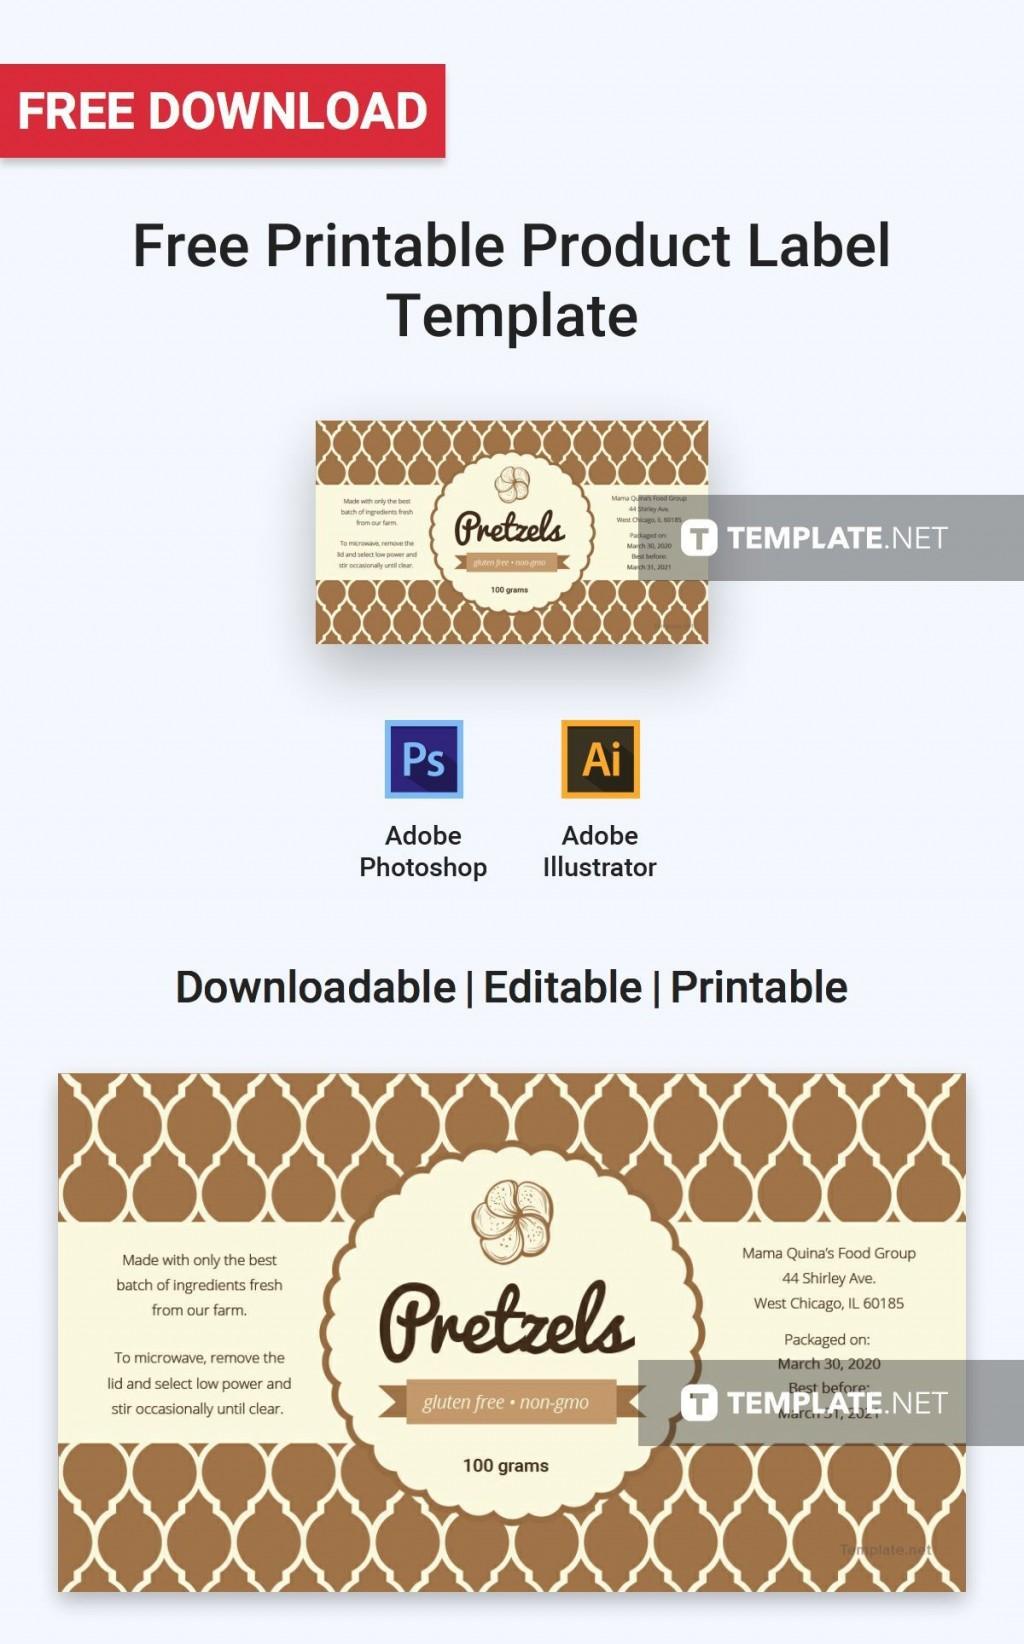 001 Amazing Free Food Label Design Template High Def  Templates DownloadLarge